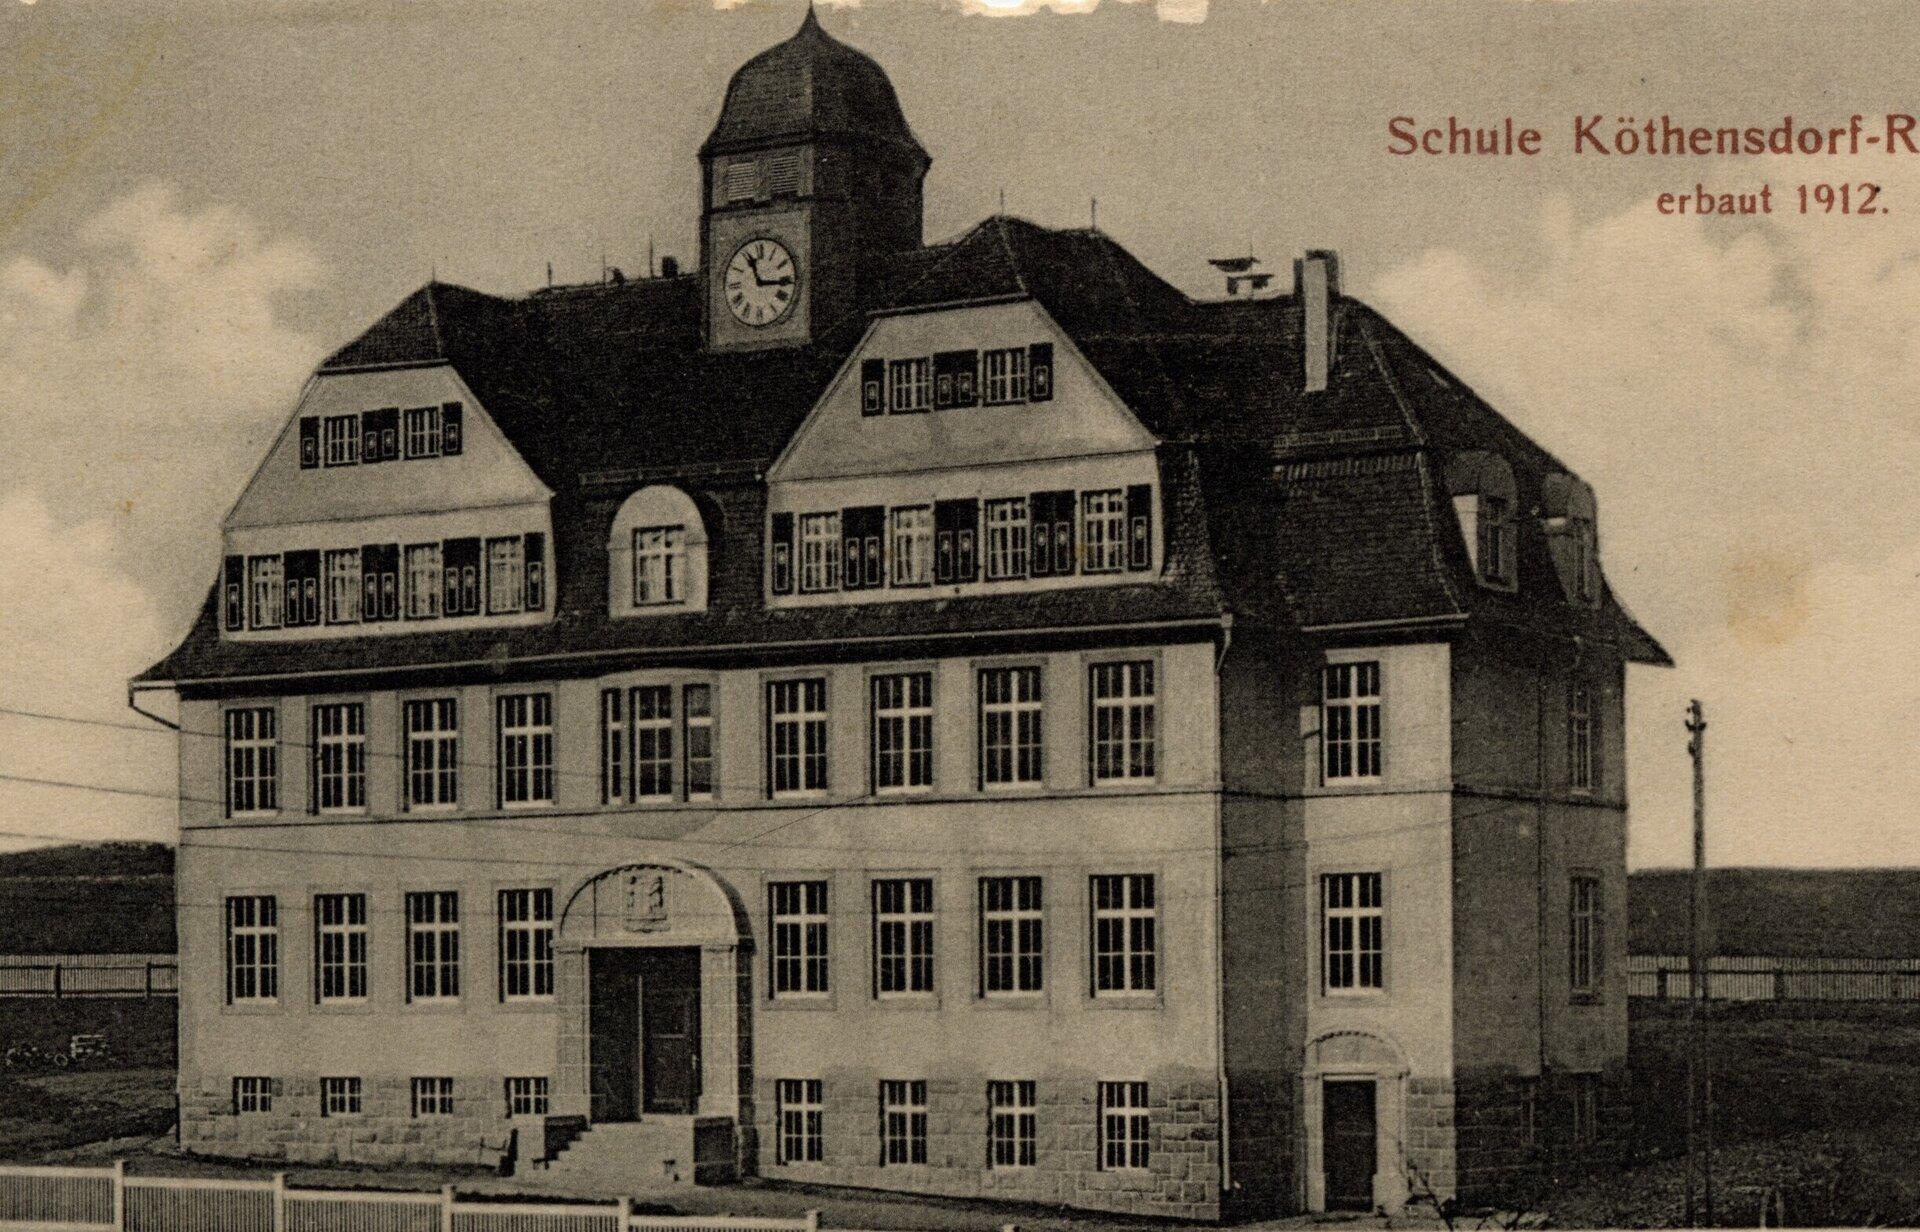 Schulneubau 1912